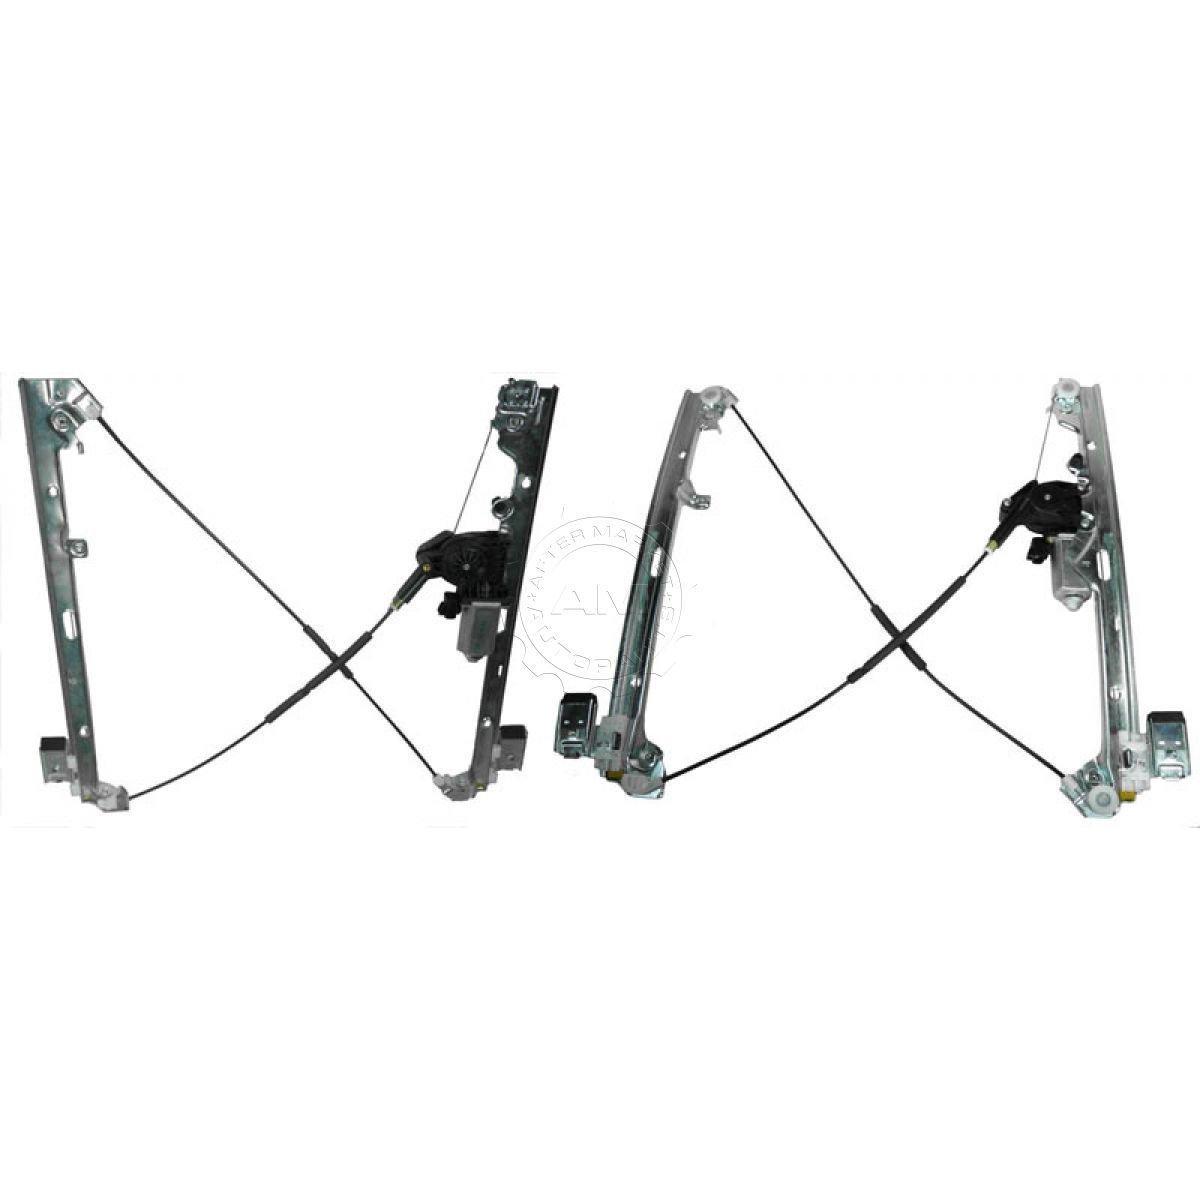 New Front Power Window Regulator W Motor Pair Set For